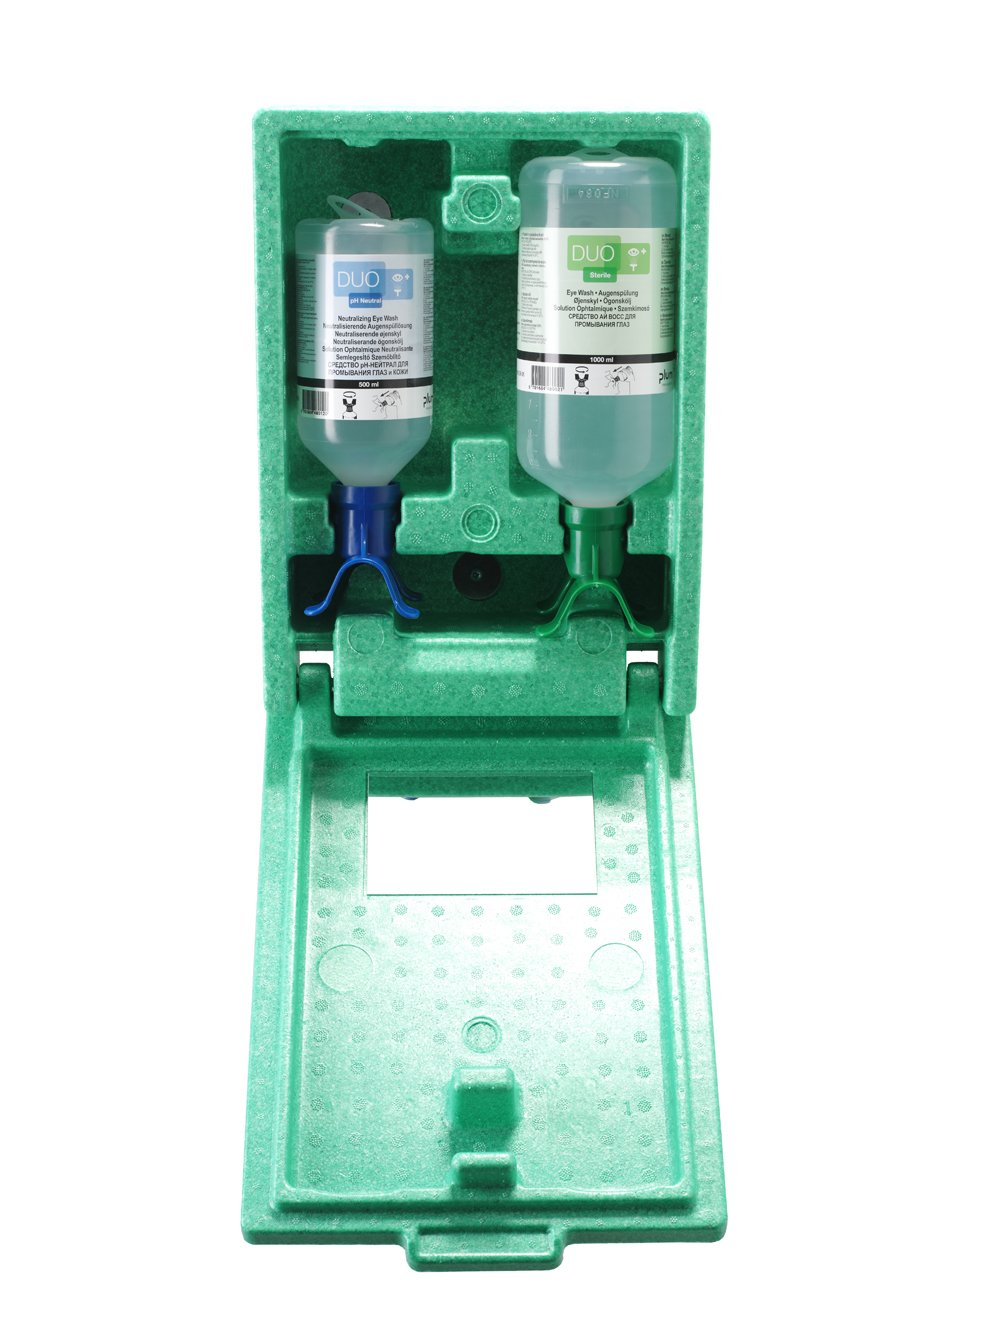 Plum 48108 Medium Duo Chemical Eyewash Station, 5'' Height, 10.5'' Wide, 14.5'' Length, 33.8 fl.oz. Volume, 4.75 lb, Plastic